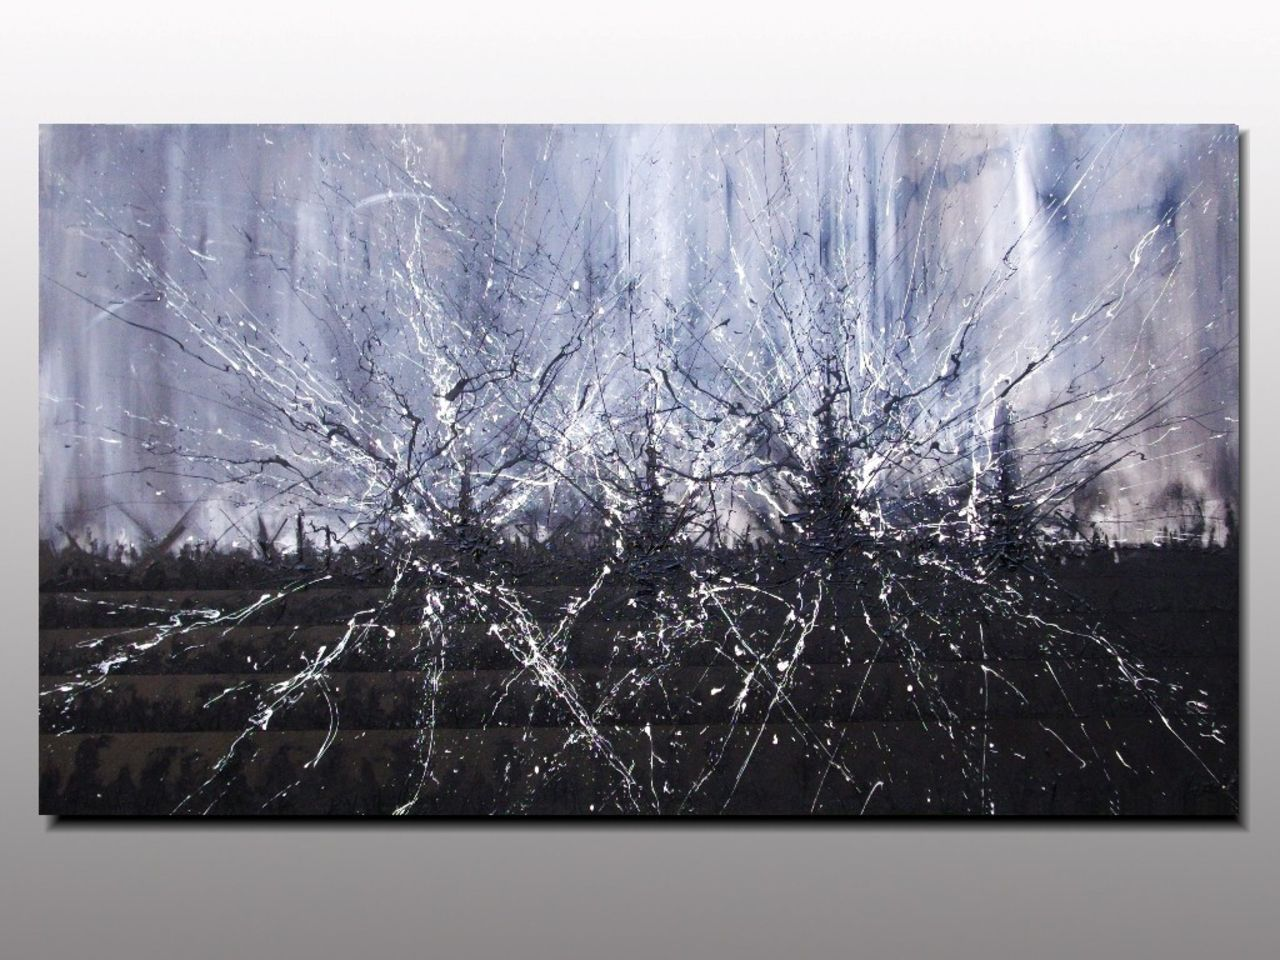 MISTER K  (Lepolsk Matuszewski) IDYLLIC DISASTER  expressionnisme abstrait  action painting dripping tubbing relief artiste peintre plasticien Lepolsk Matuszews